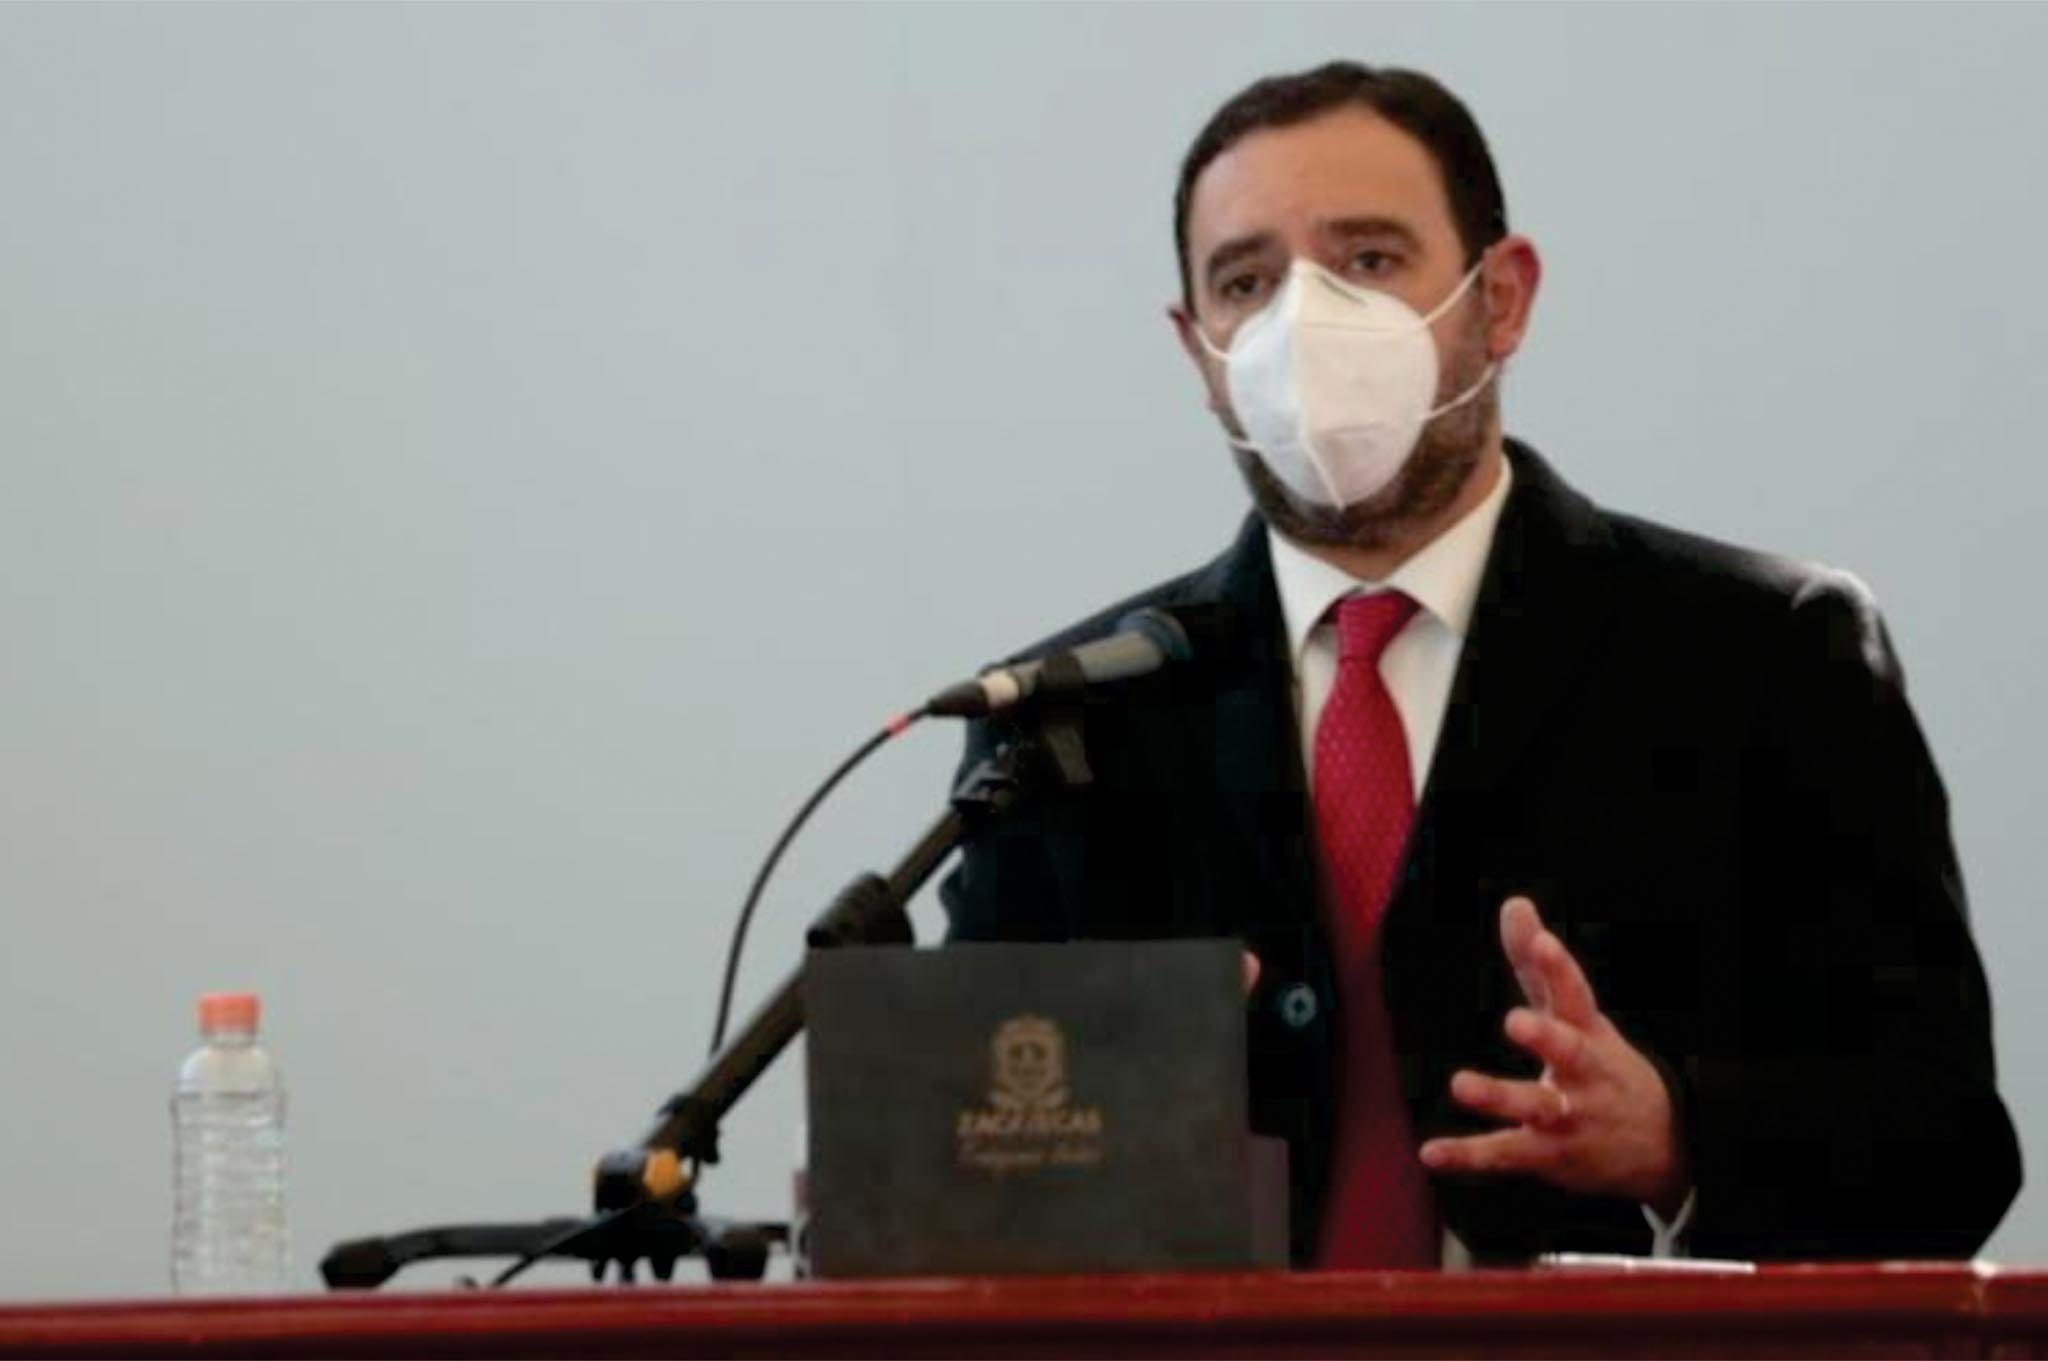 Para vacunas, gobernador destina 50 millones de pesos